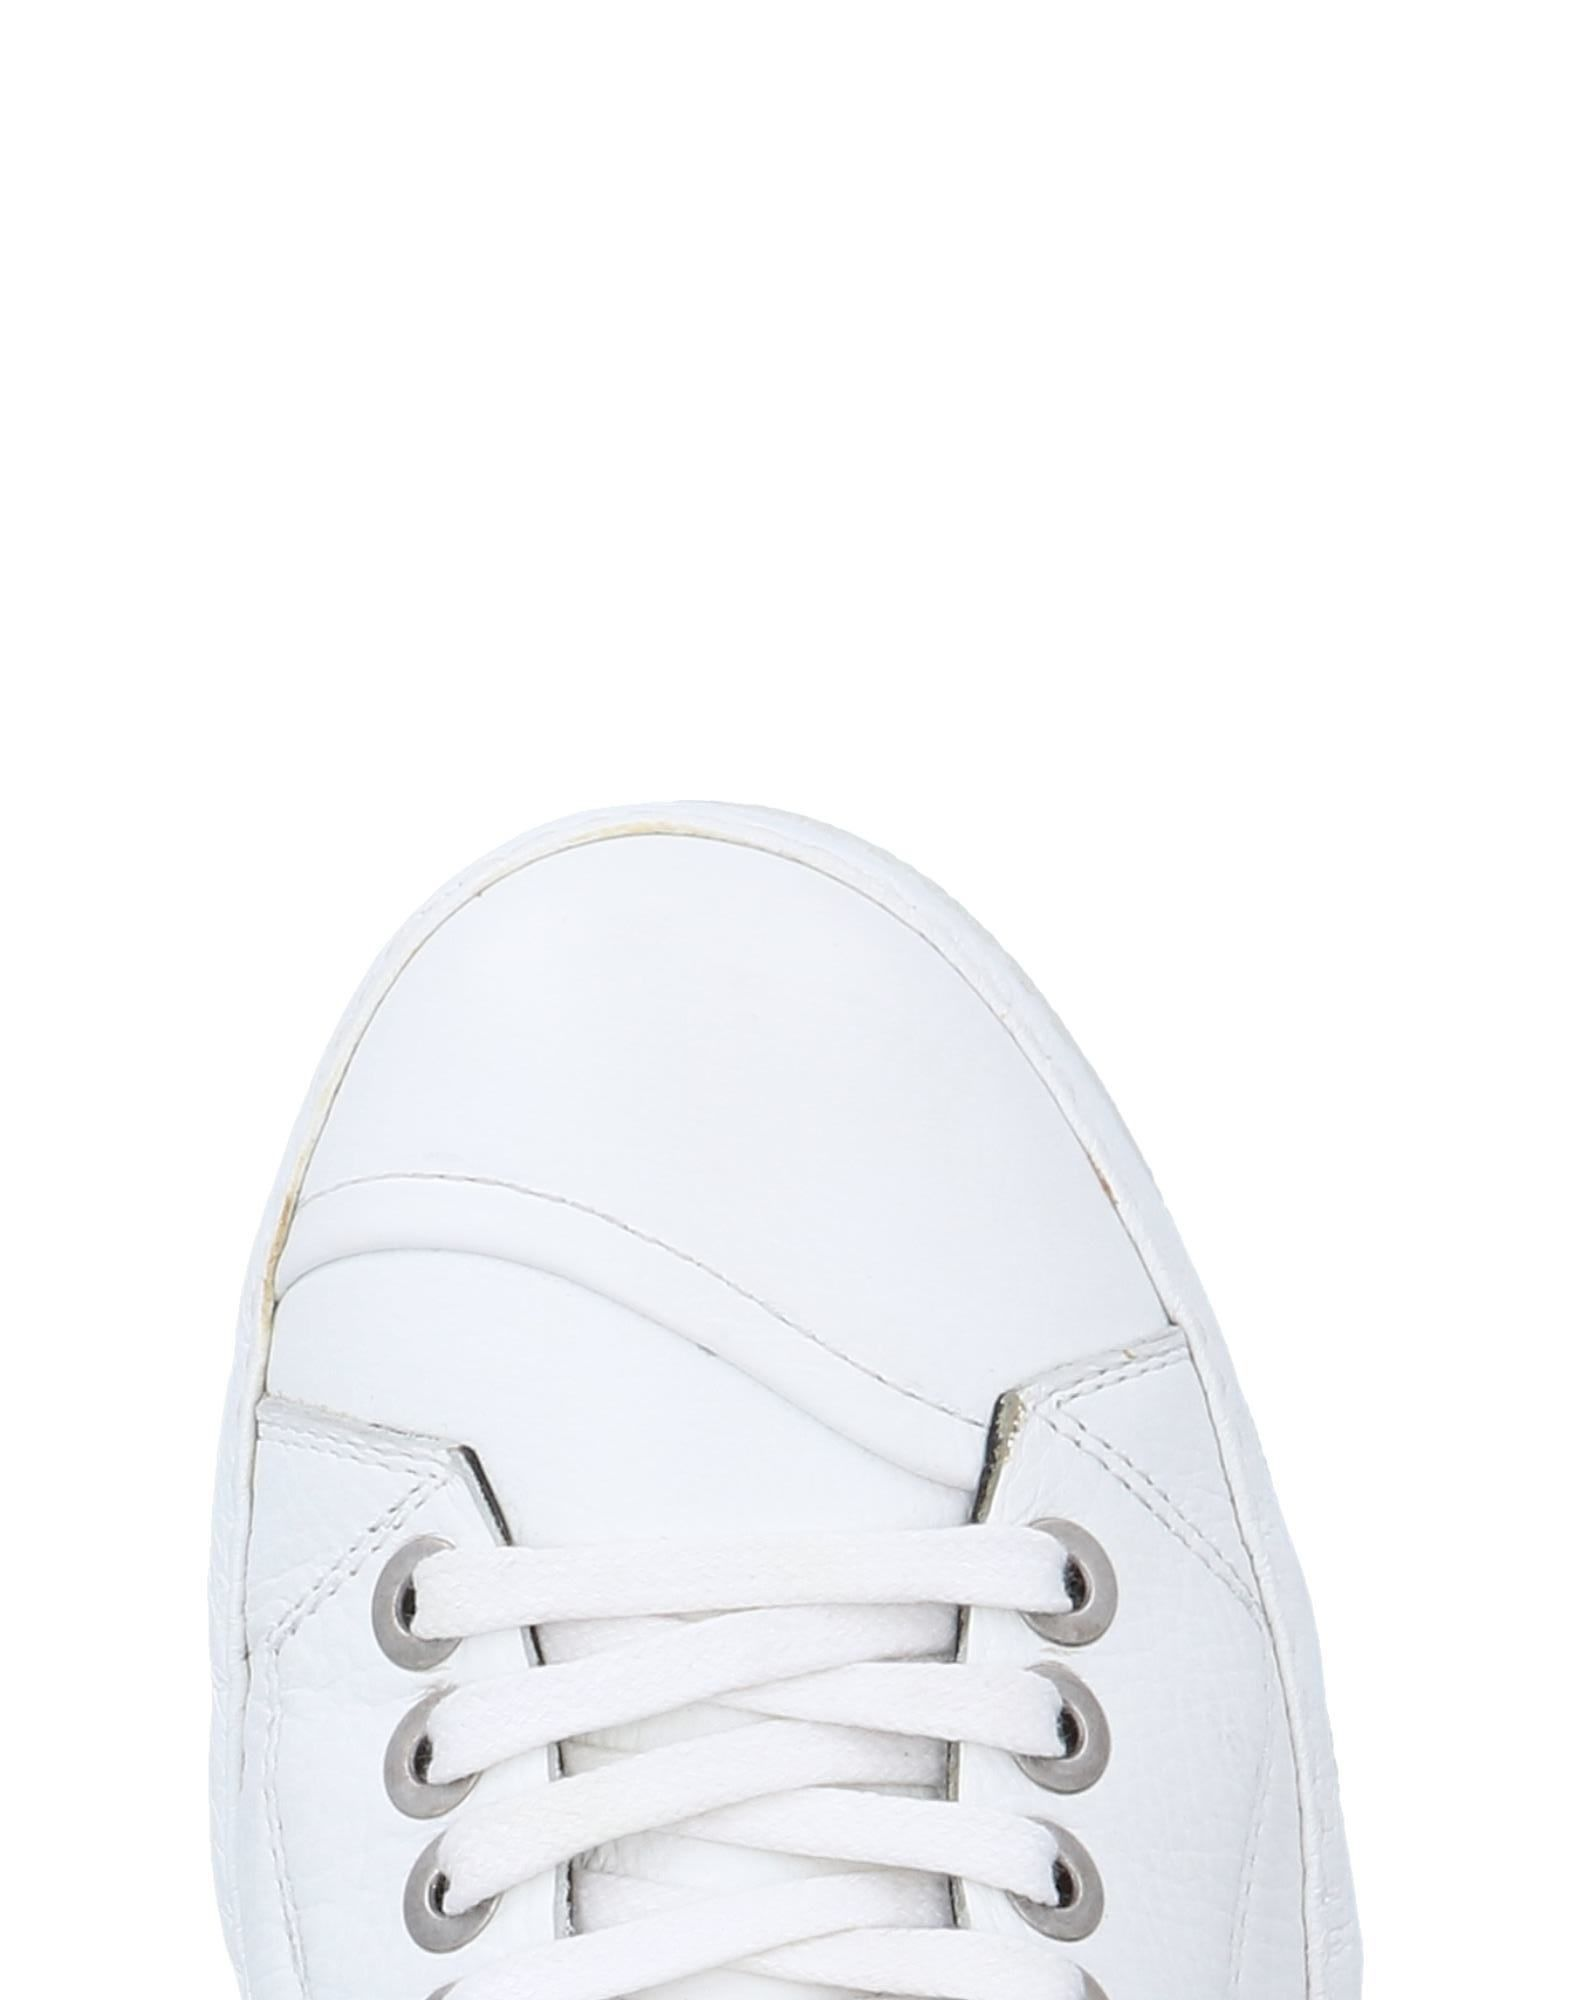 Bruno Bordese 11291721MK Sneakers Herren  11291721MK Bordese 44e9fc